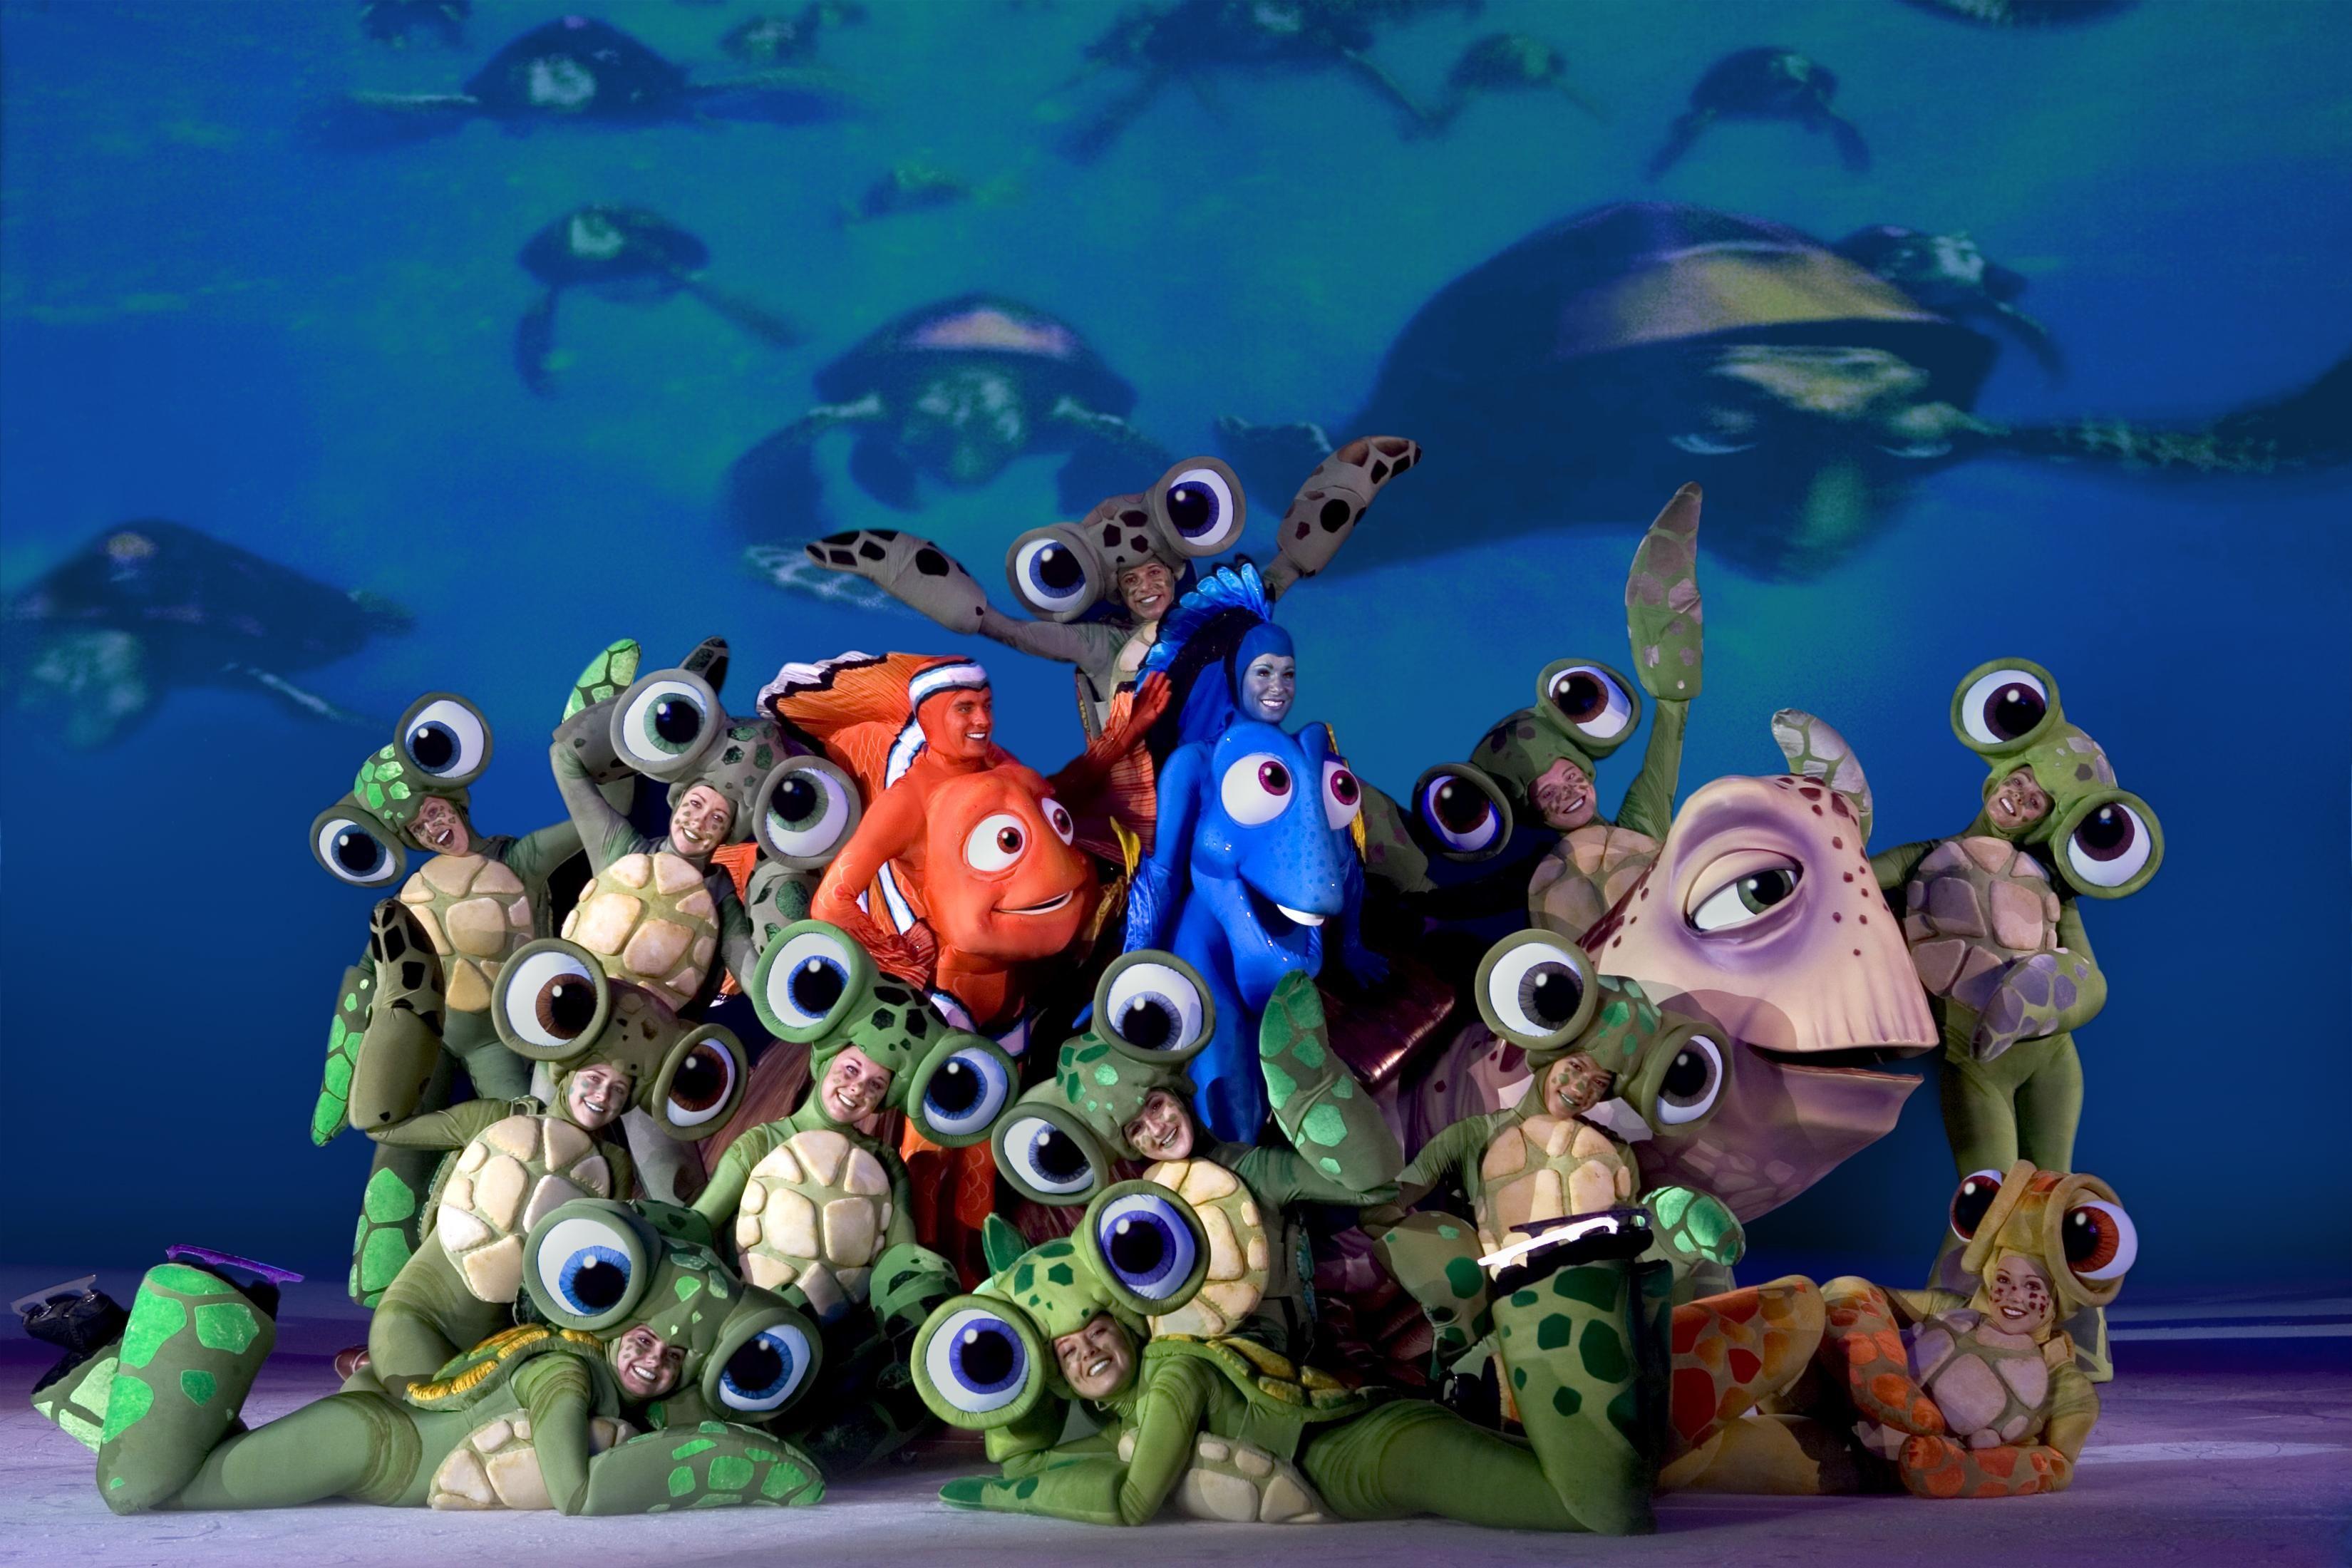 Finding Nemo D Animasi Hd Wallpaper: Finding Nemo HD Wallpapers 12